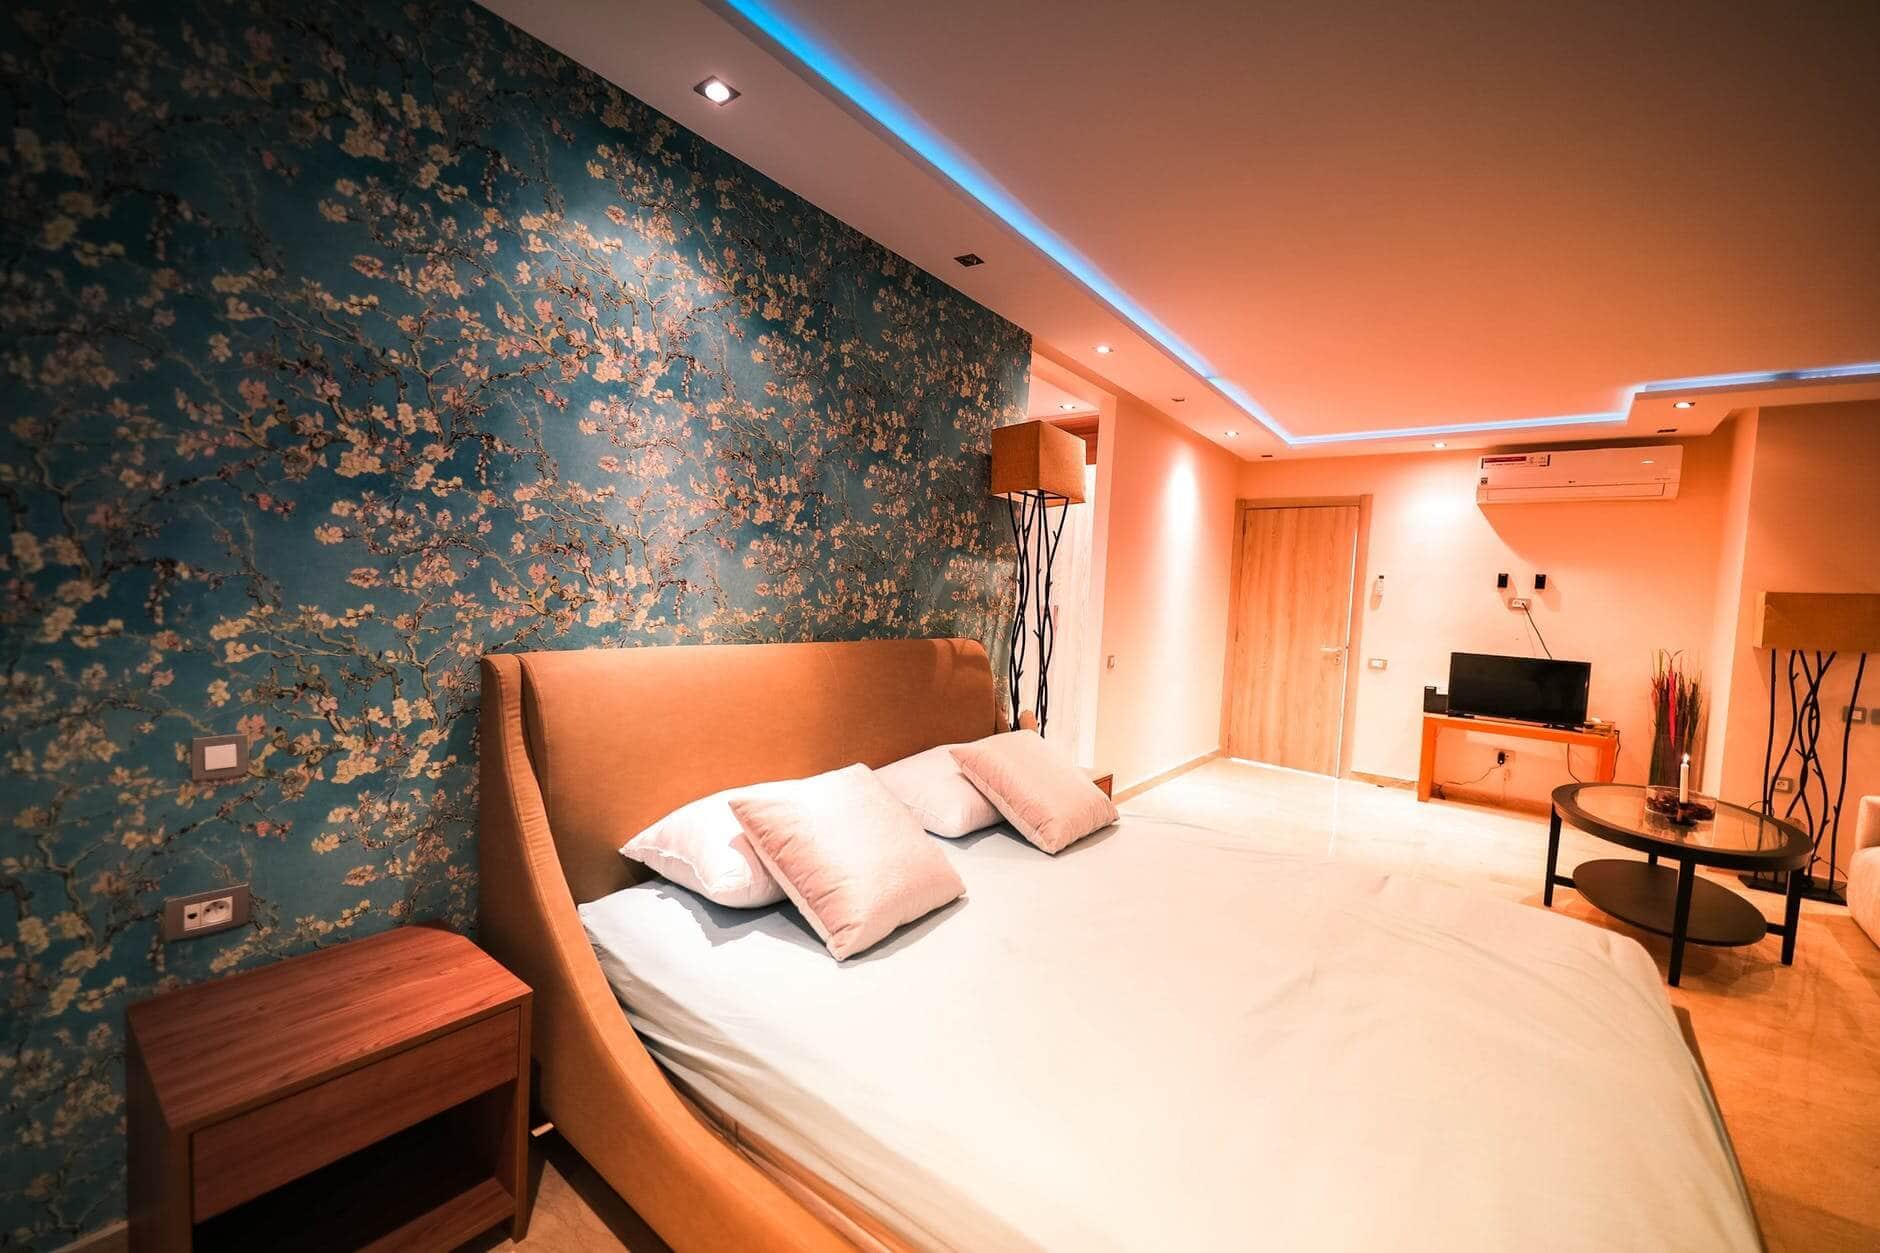 Small bedroom lighting designs 28